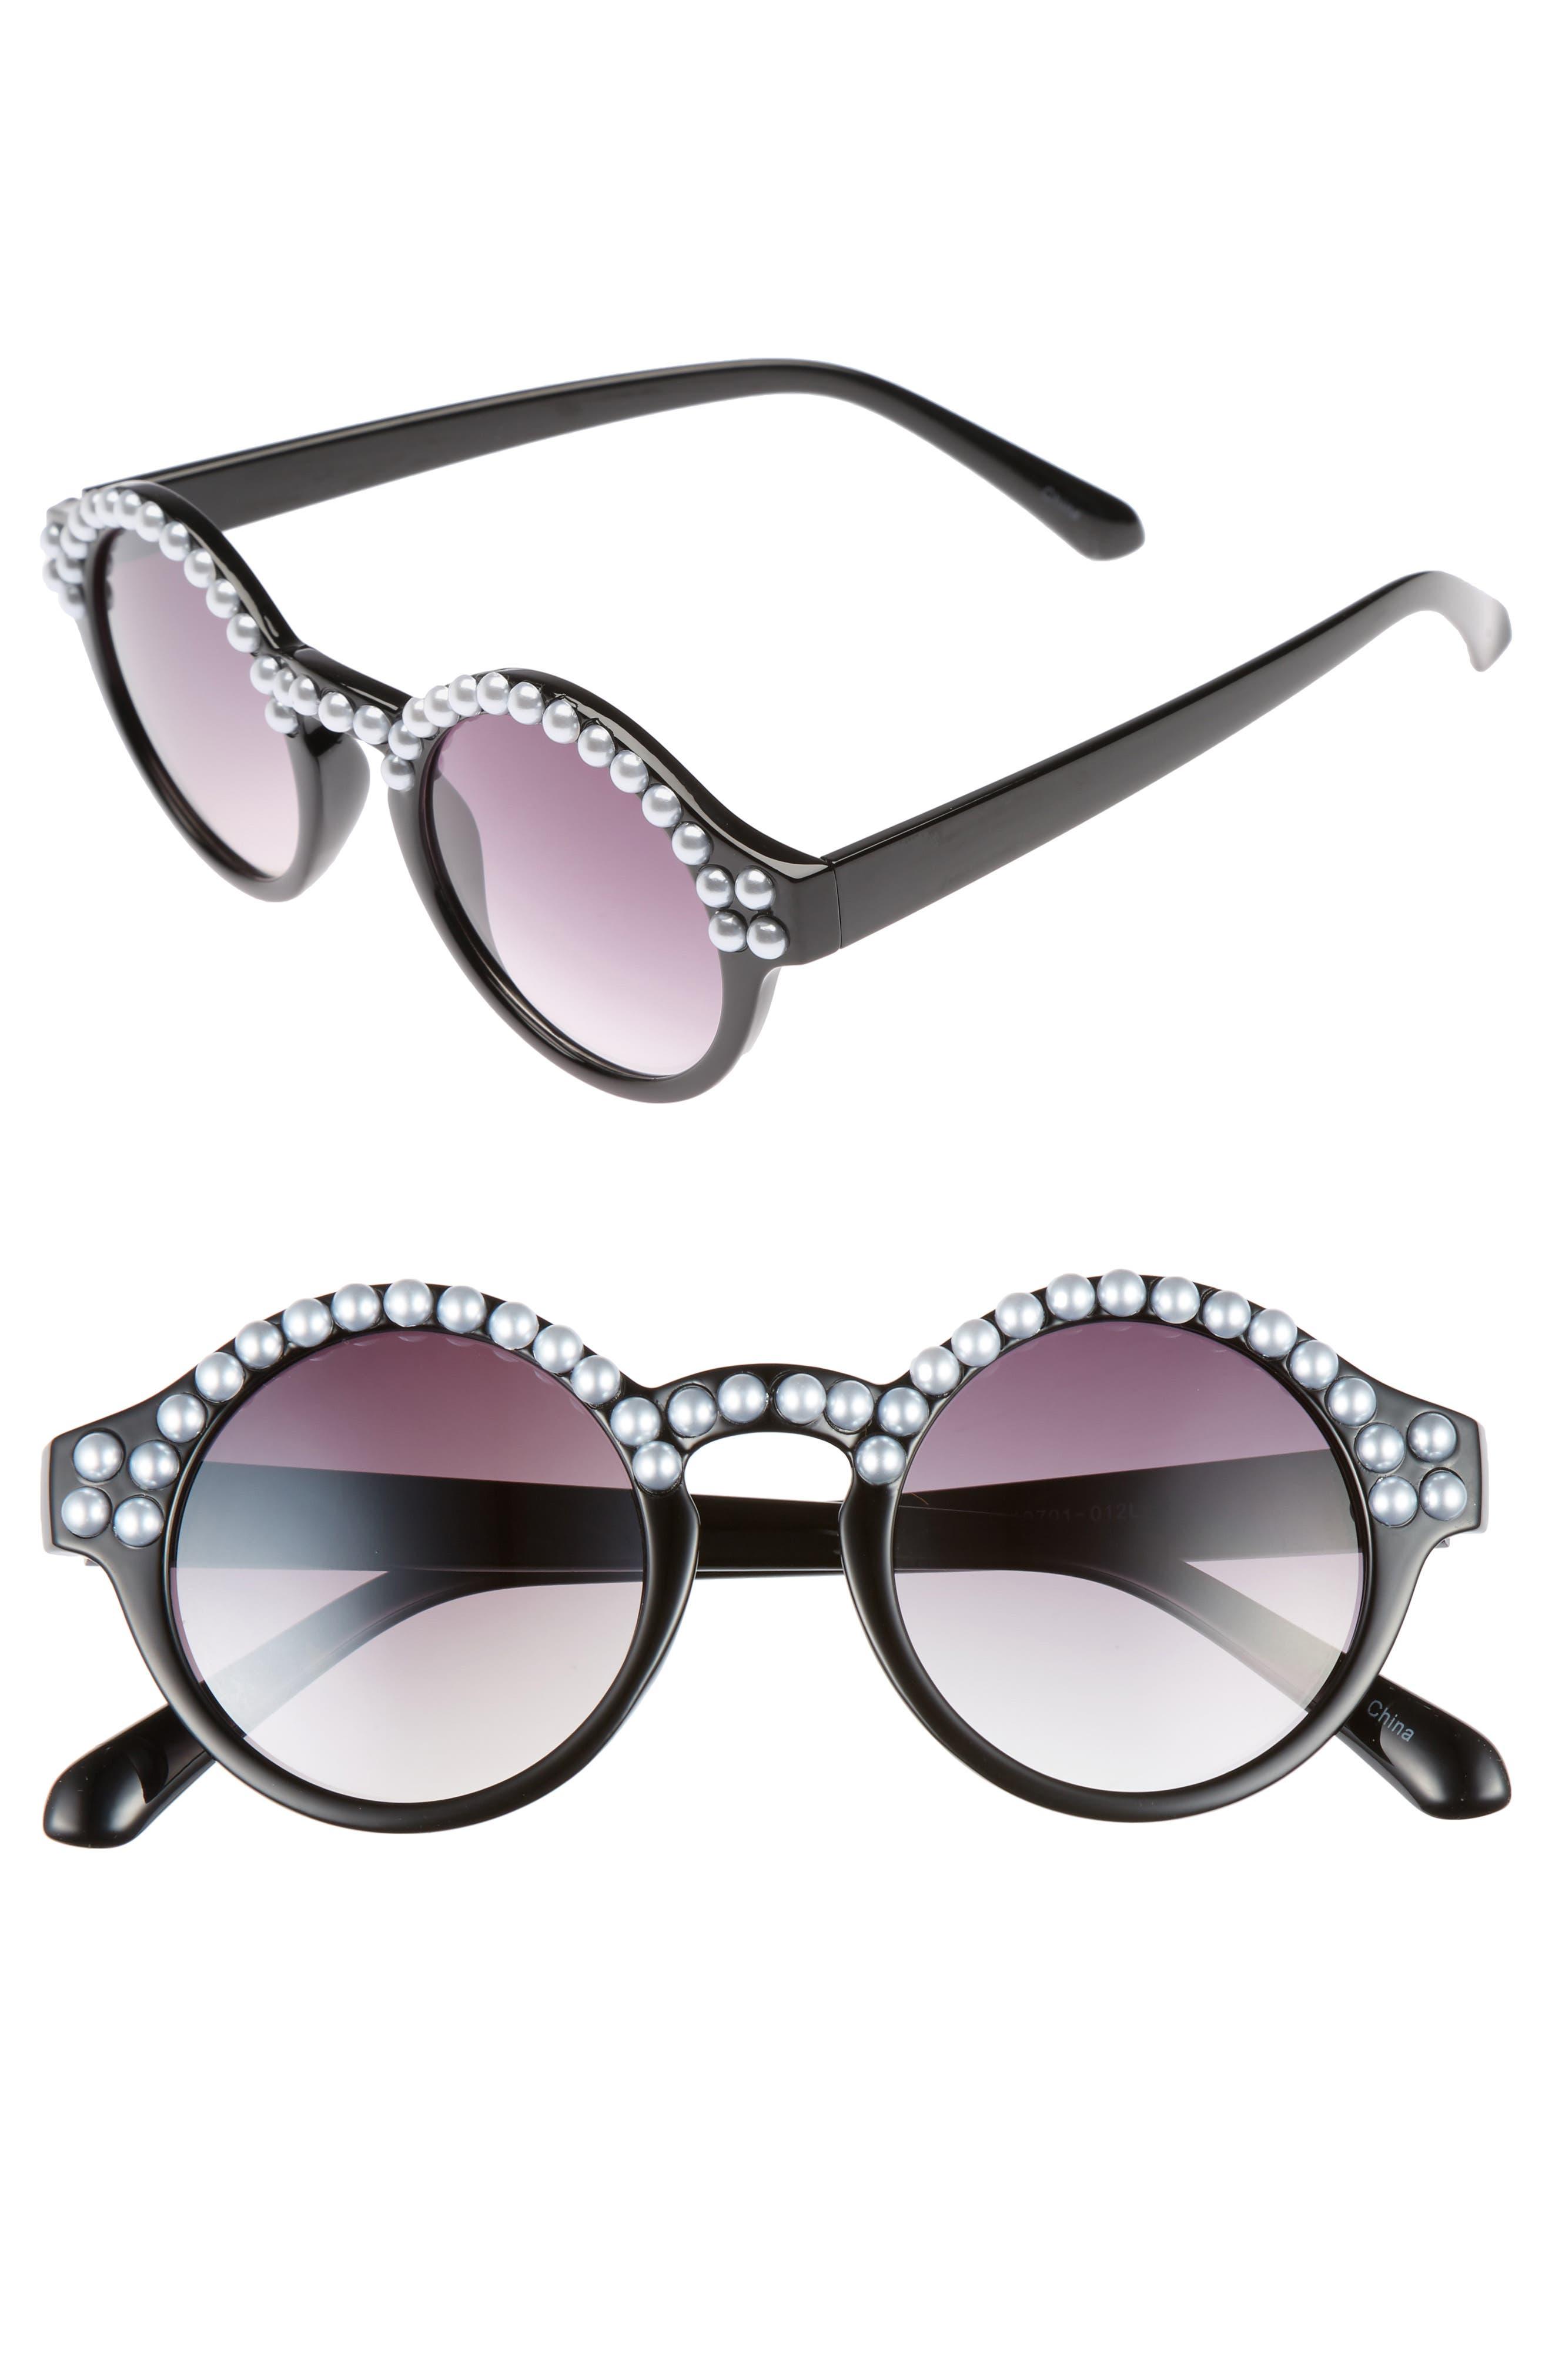 45mm Imitation Pearl Round Sunglasses,                             Main thumbnail 1, color,                             Black